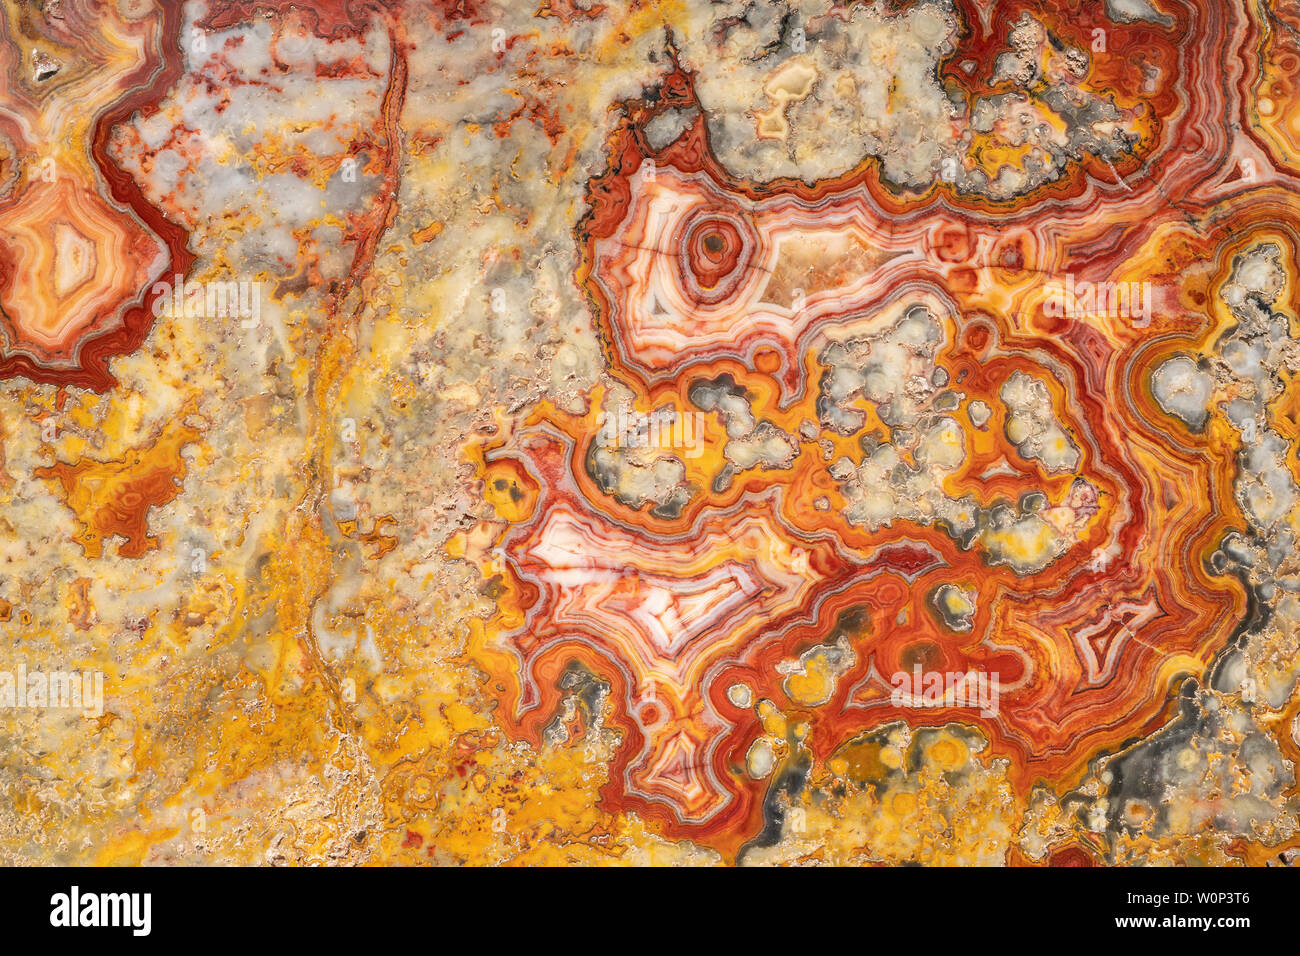 Australian crazy lace agate. Origin: Marillana, Australia. Courtesy of ZRS Fossils, By Dominique Braud/Dembinsky Photo Assoc Stock Photo